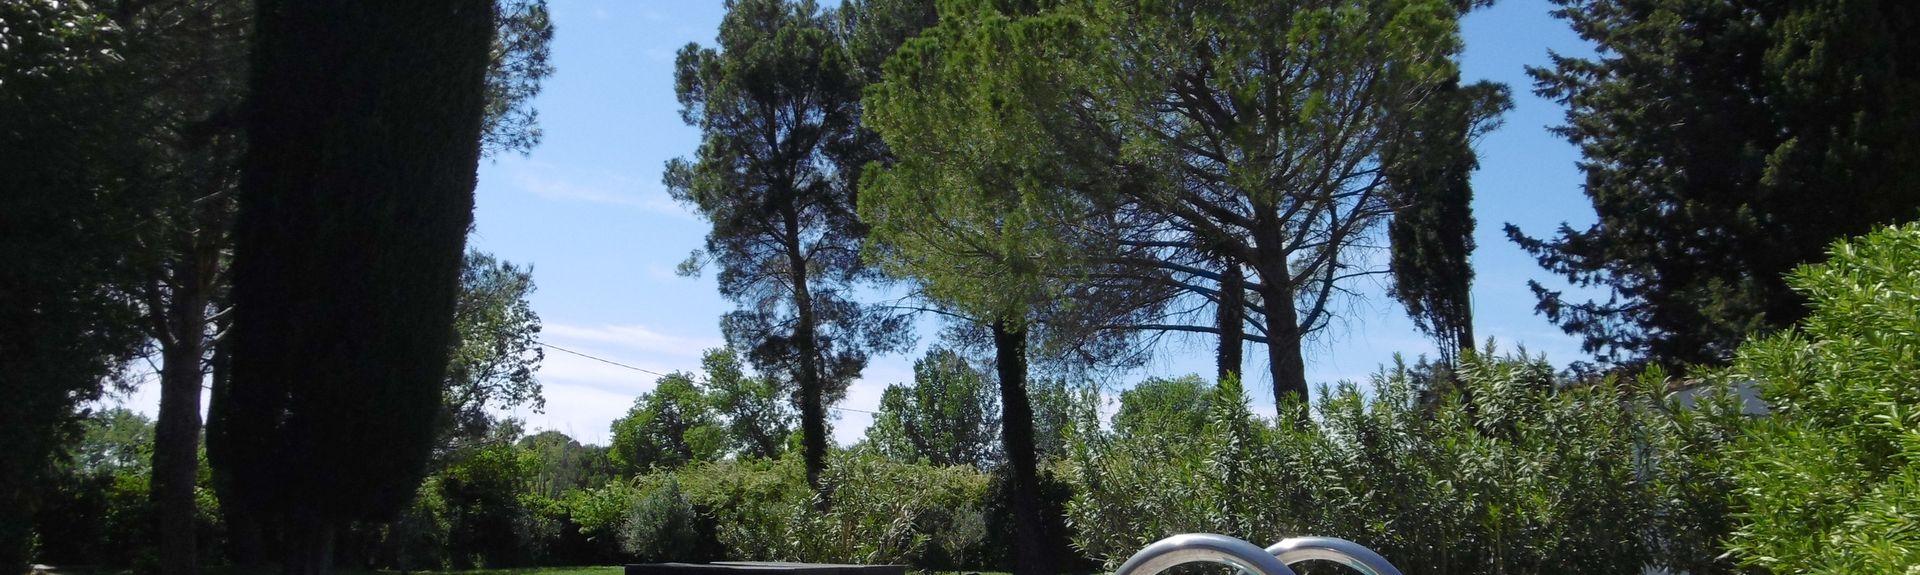 Raphele-les-Arles, Arlés, PACA, Francia